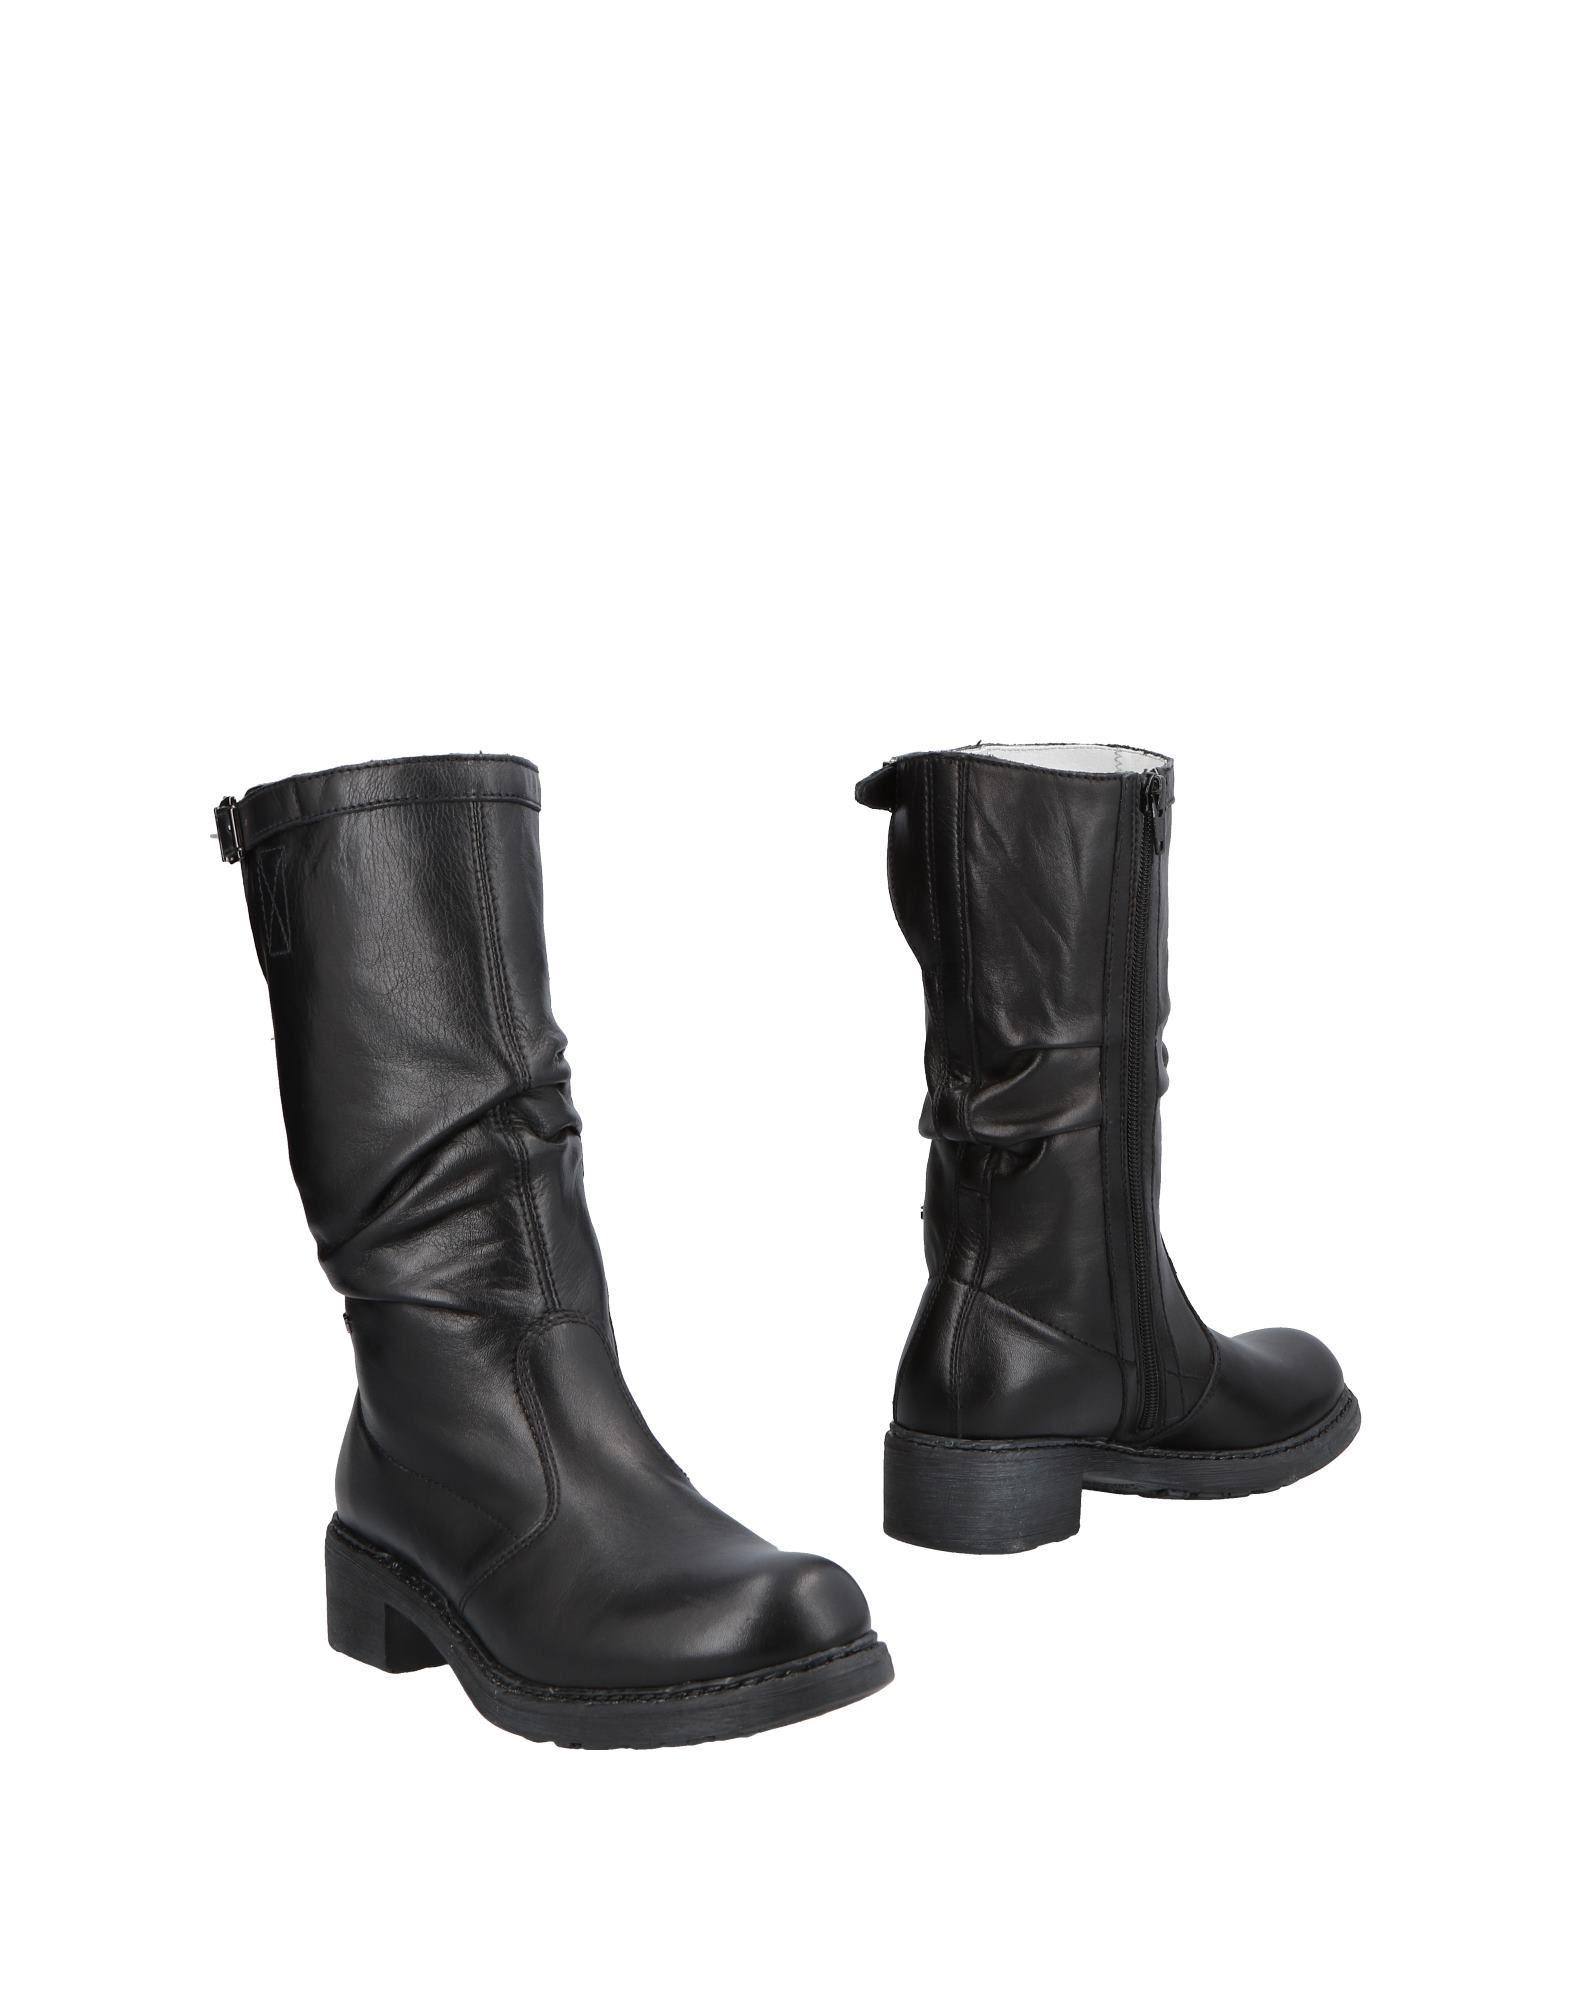 Nero Giardini Stiefelette Damen  11487537HO Gute Qualität beliebte Schuhe